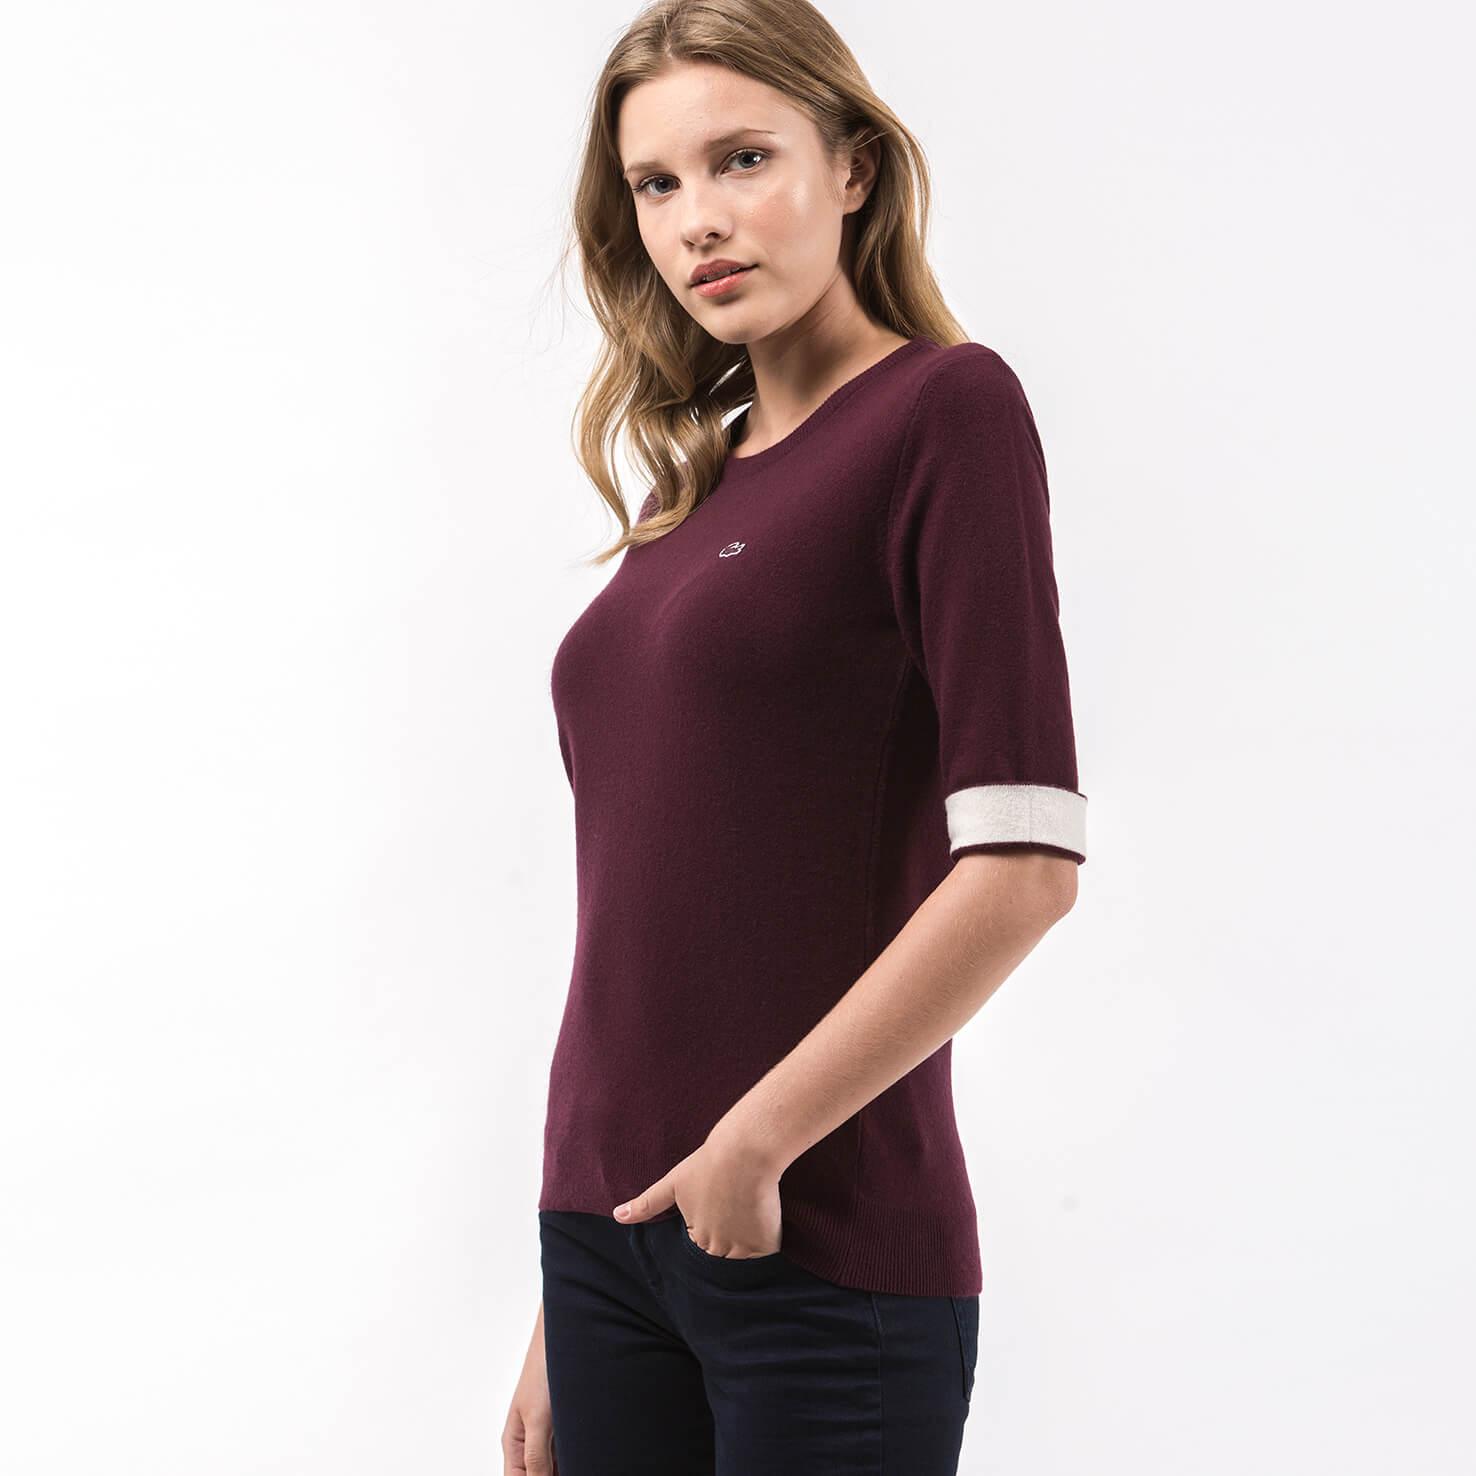 Фото 2 - Женский свитер Lacoste бордового цвета